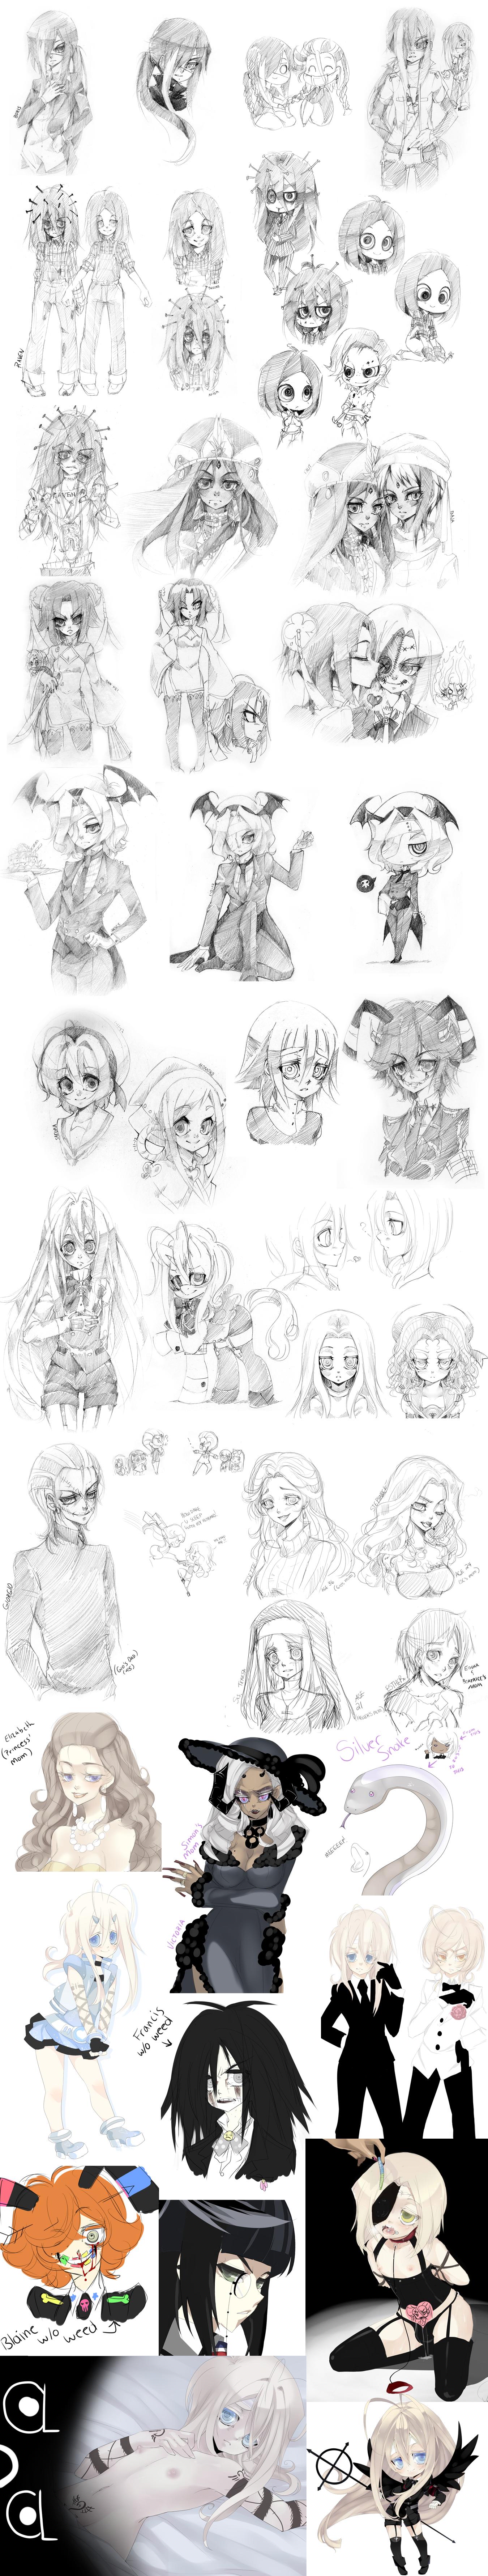 Sketch Dump 7 by TerraTerrific